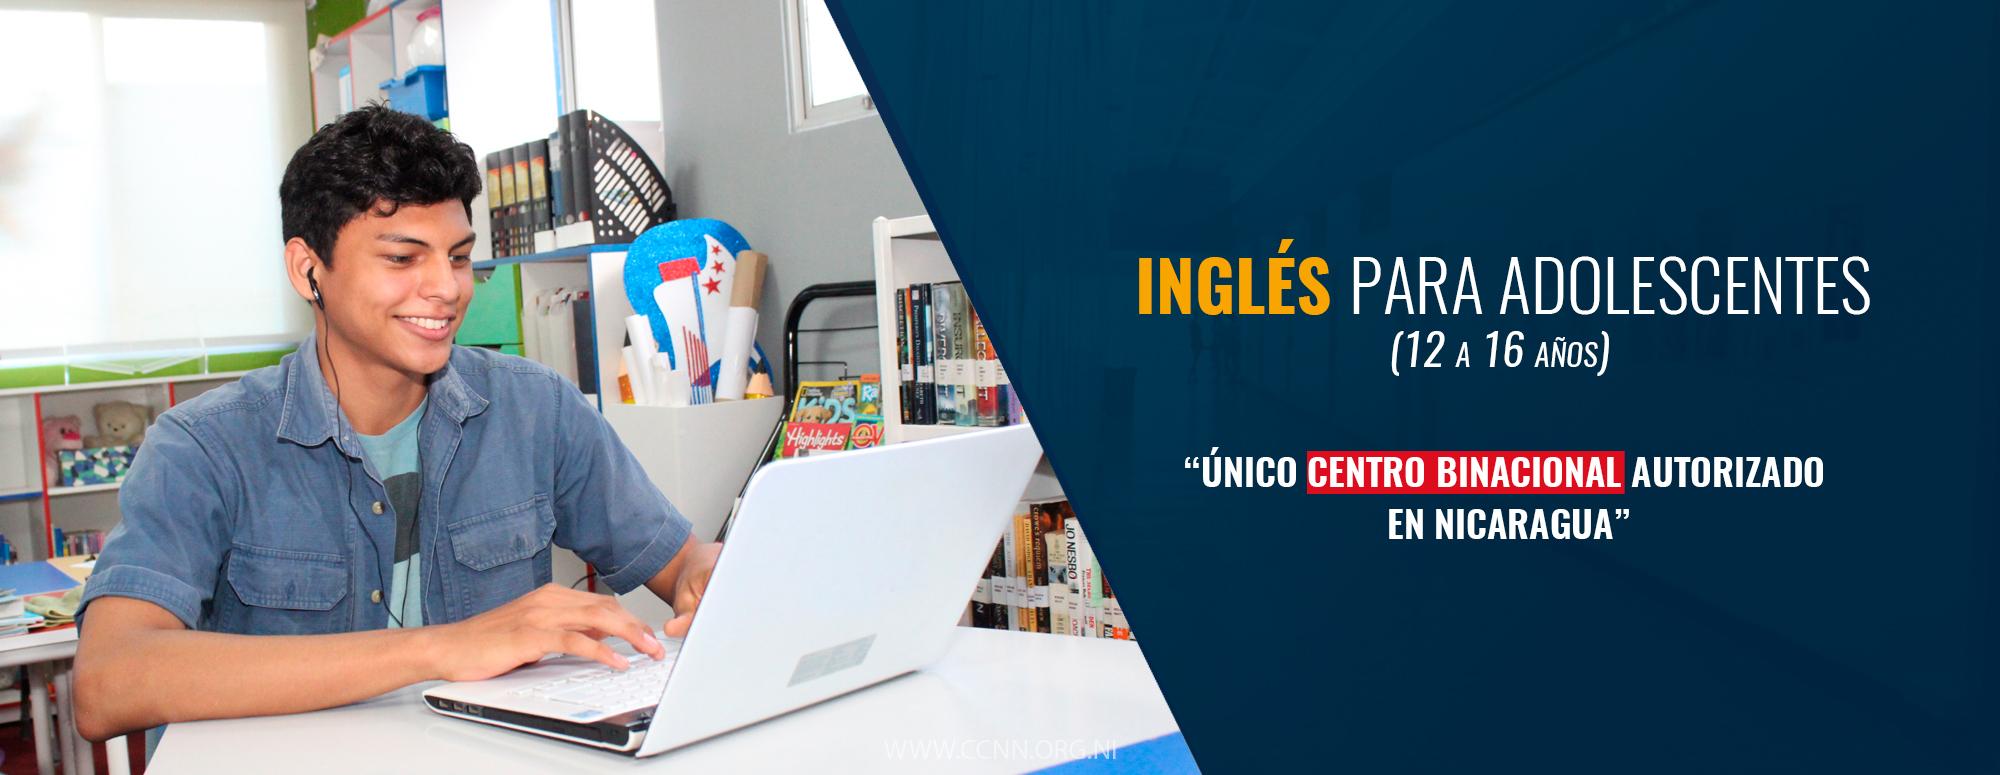 Inglés para Adolescentes - CCNN Nicaragua